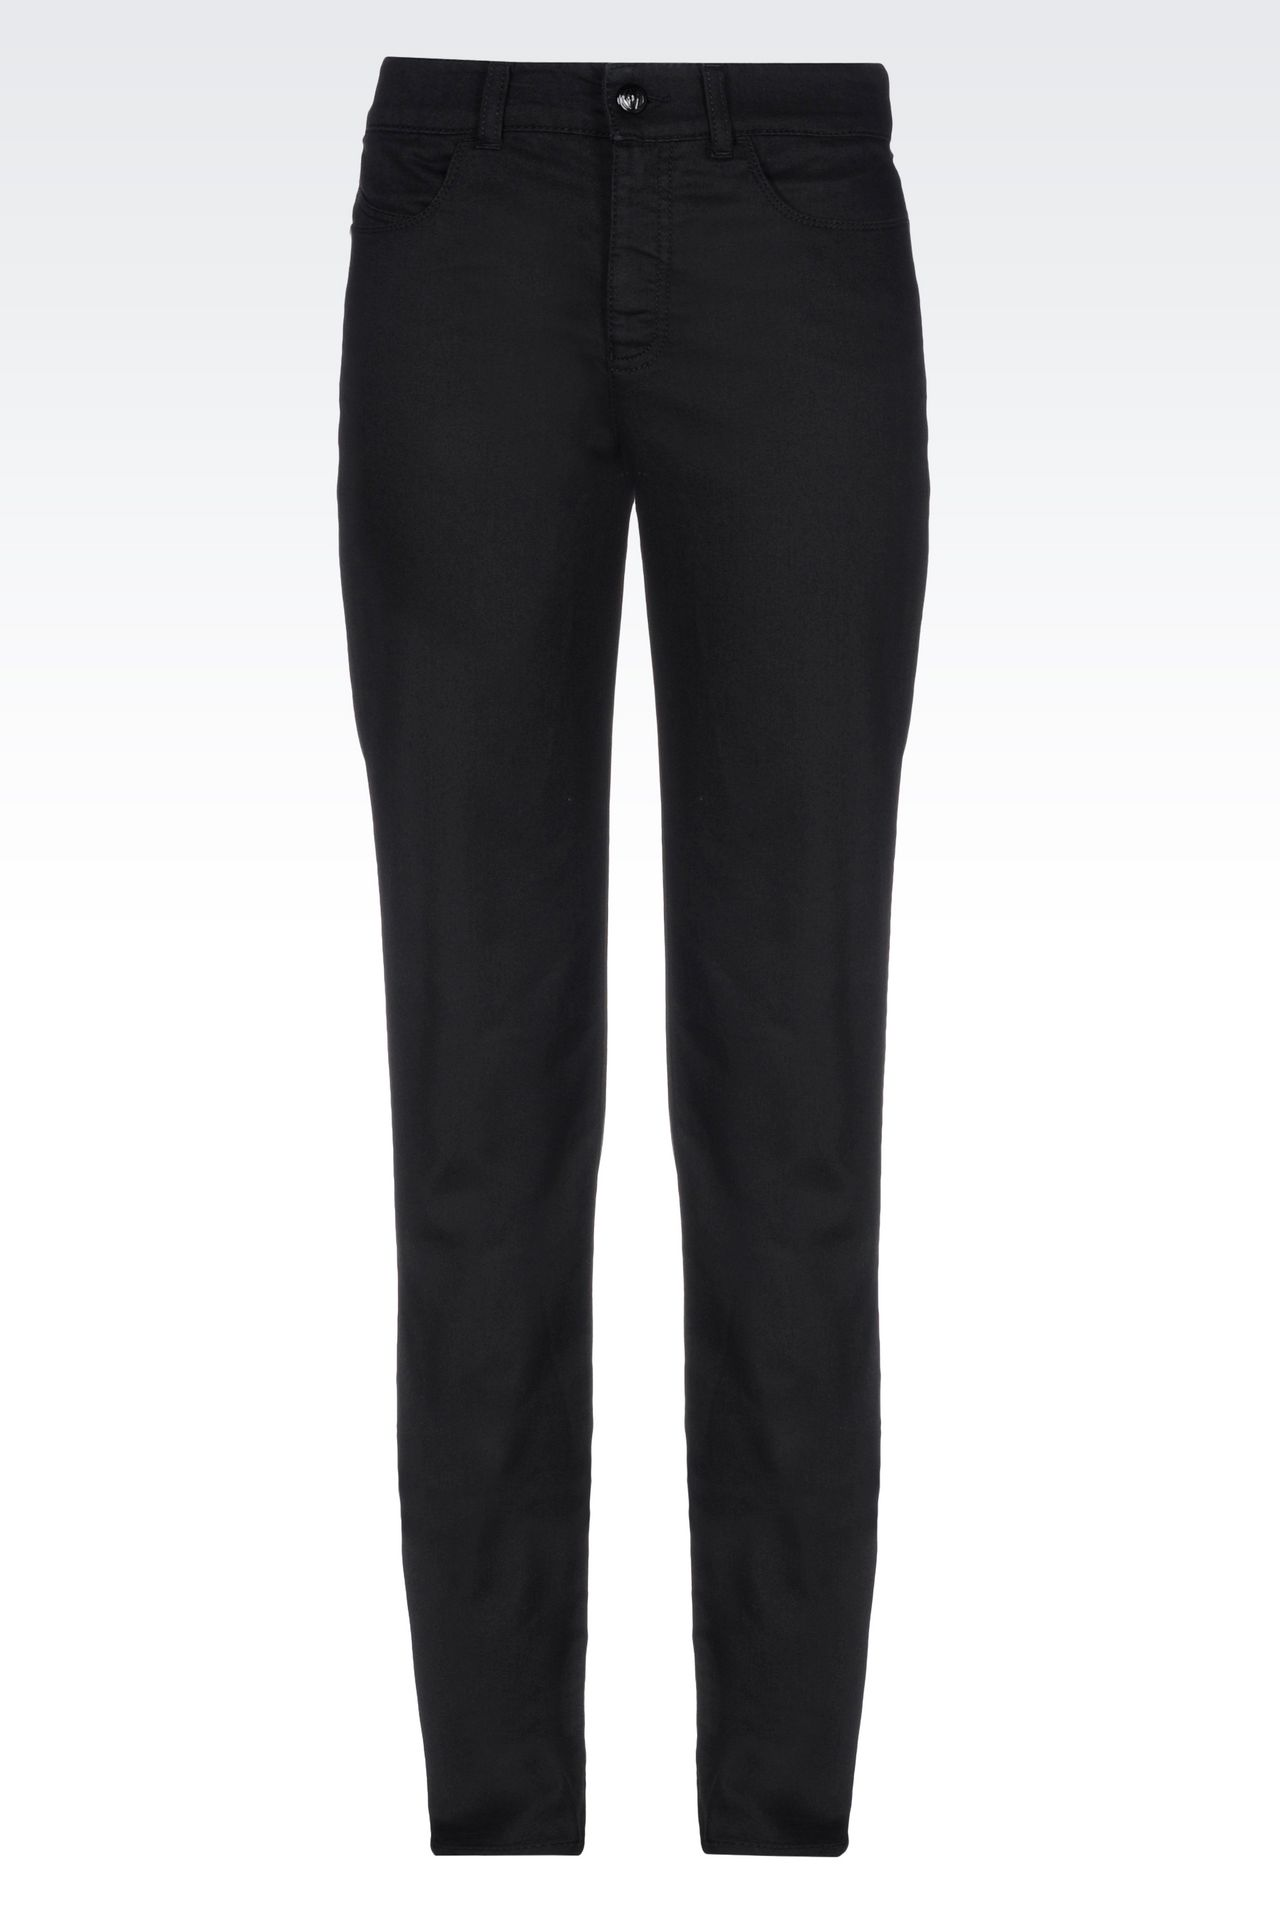 SLIM FIT BLACK WASH JEANS: Jeans Women by Armani - 0